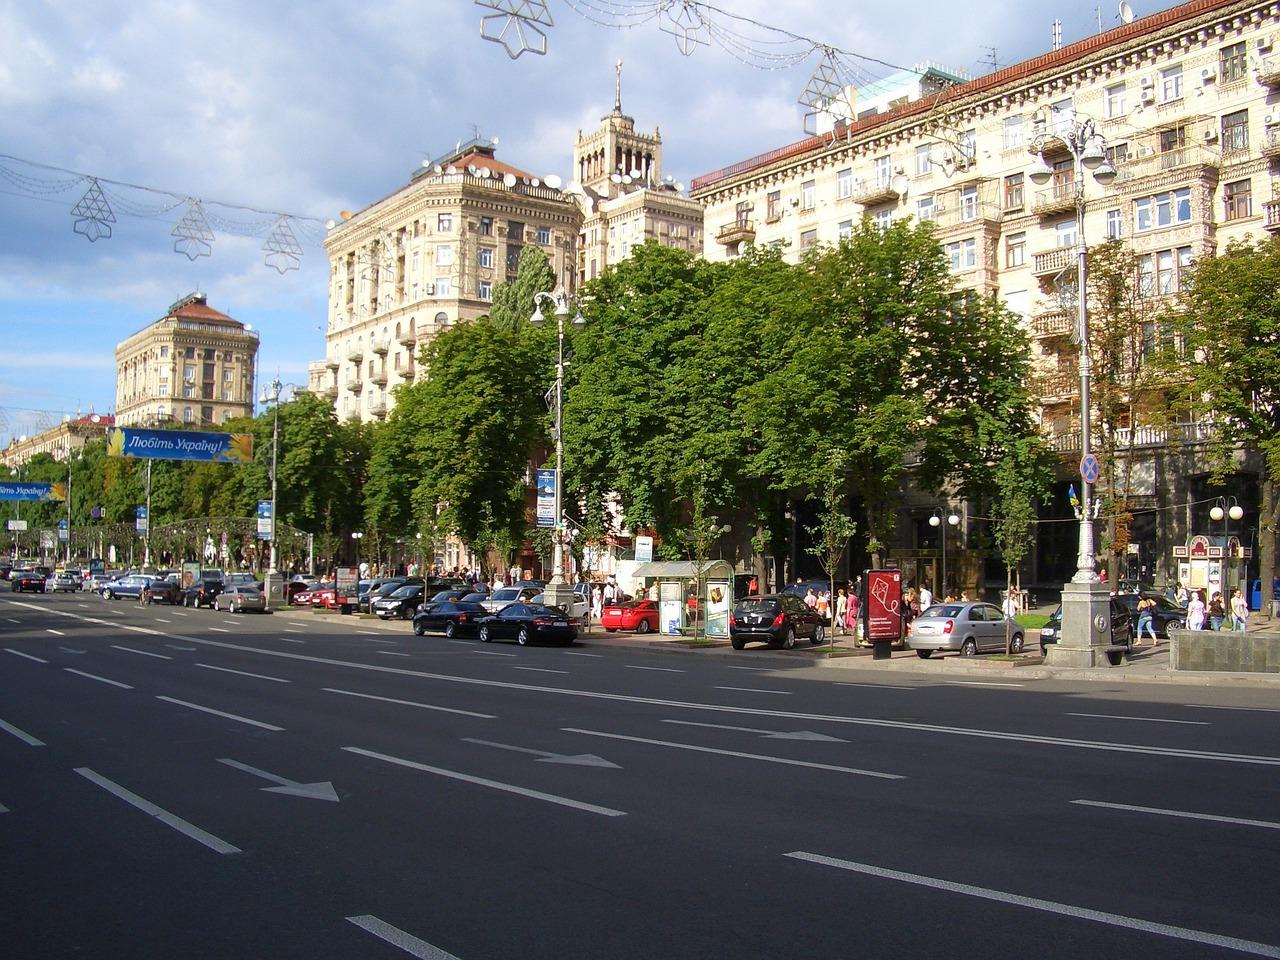 A day in Kyiv Khreshchatyk